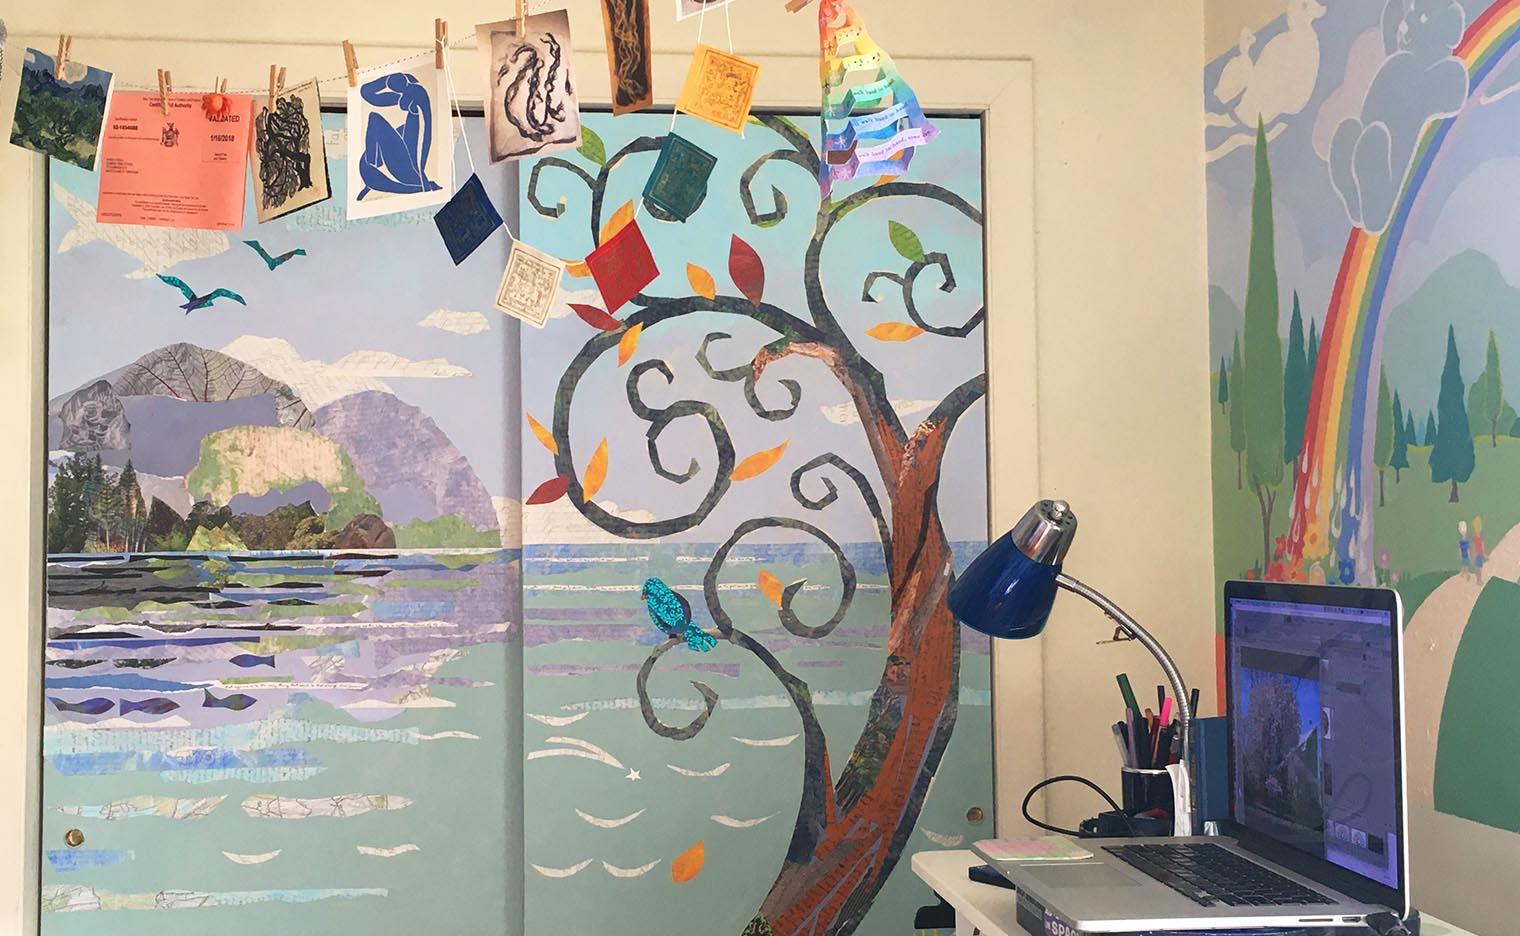 closet doors painted with an island scene